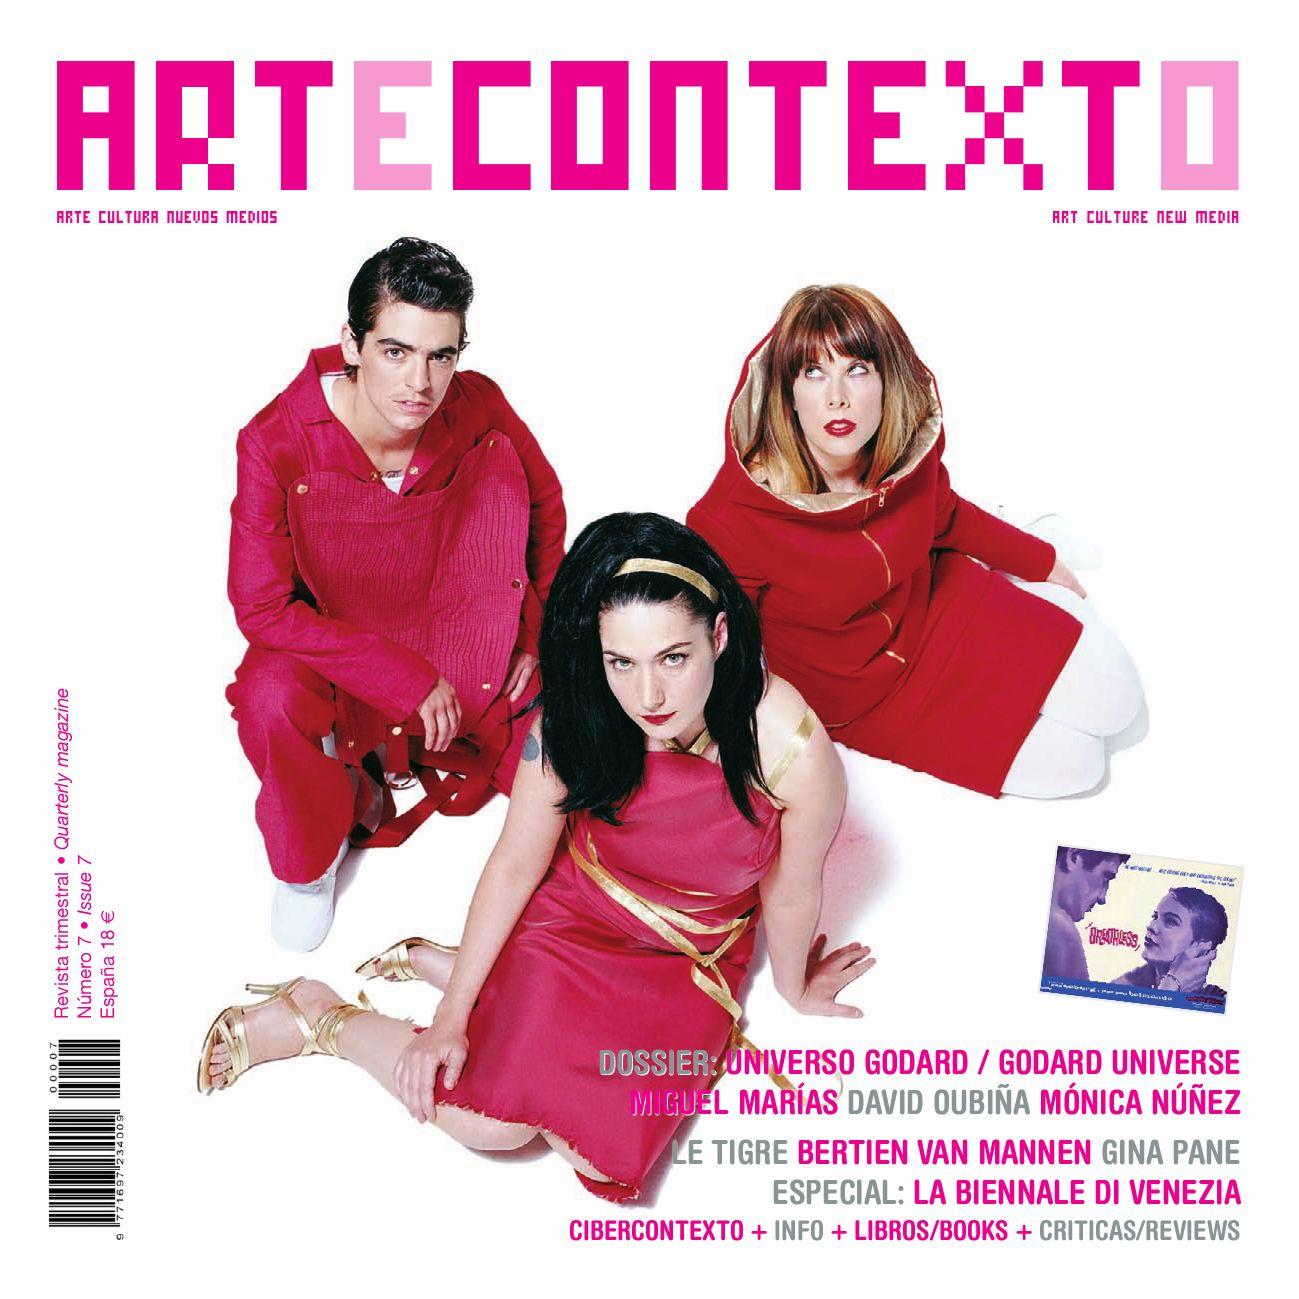 ARTECONTEXTO Nº7 by ARTEHOY Publicaciones y Gestion SL - issuu 883ef13e88172